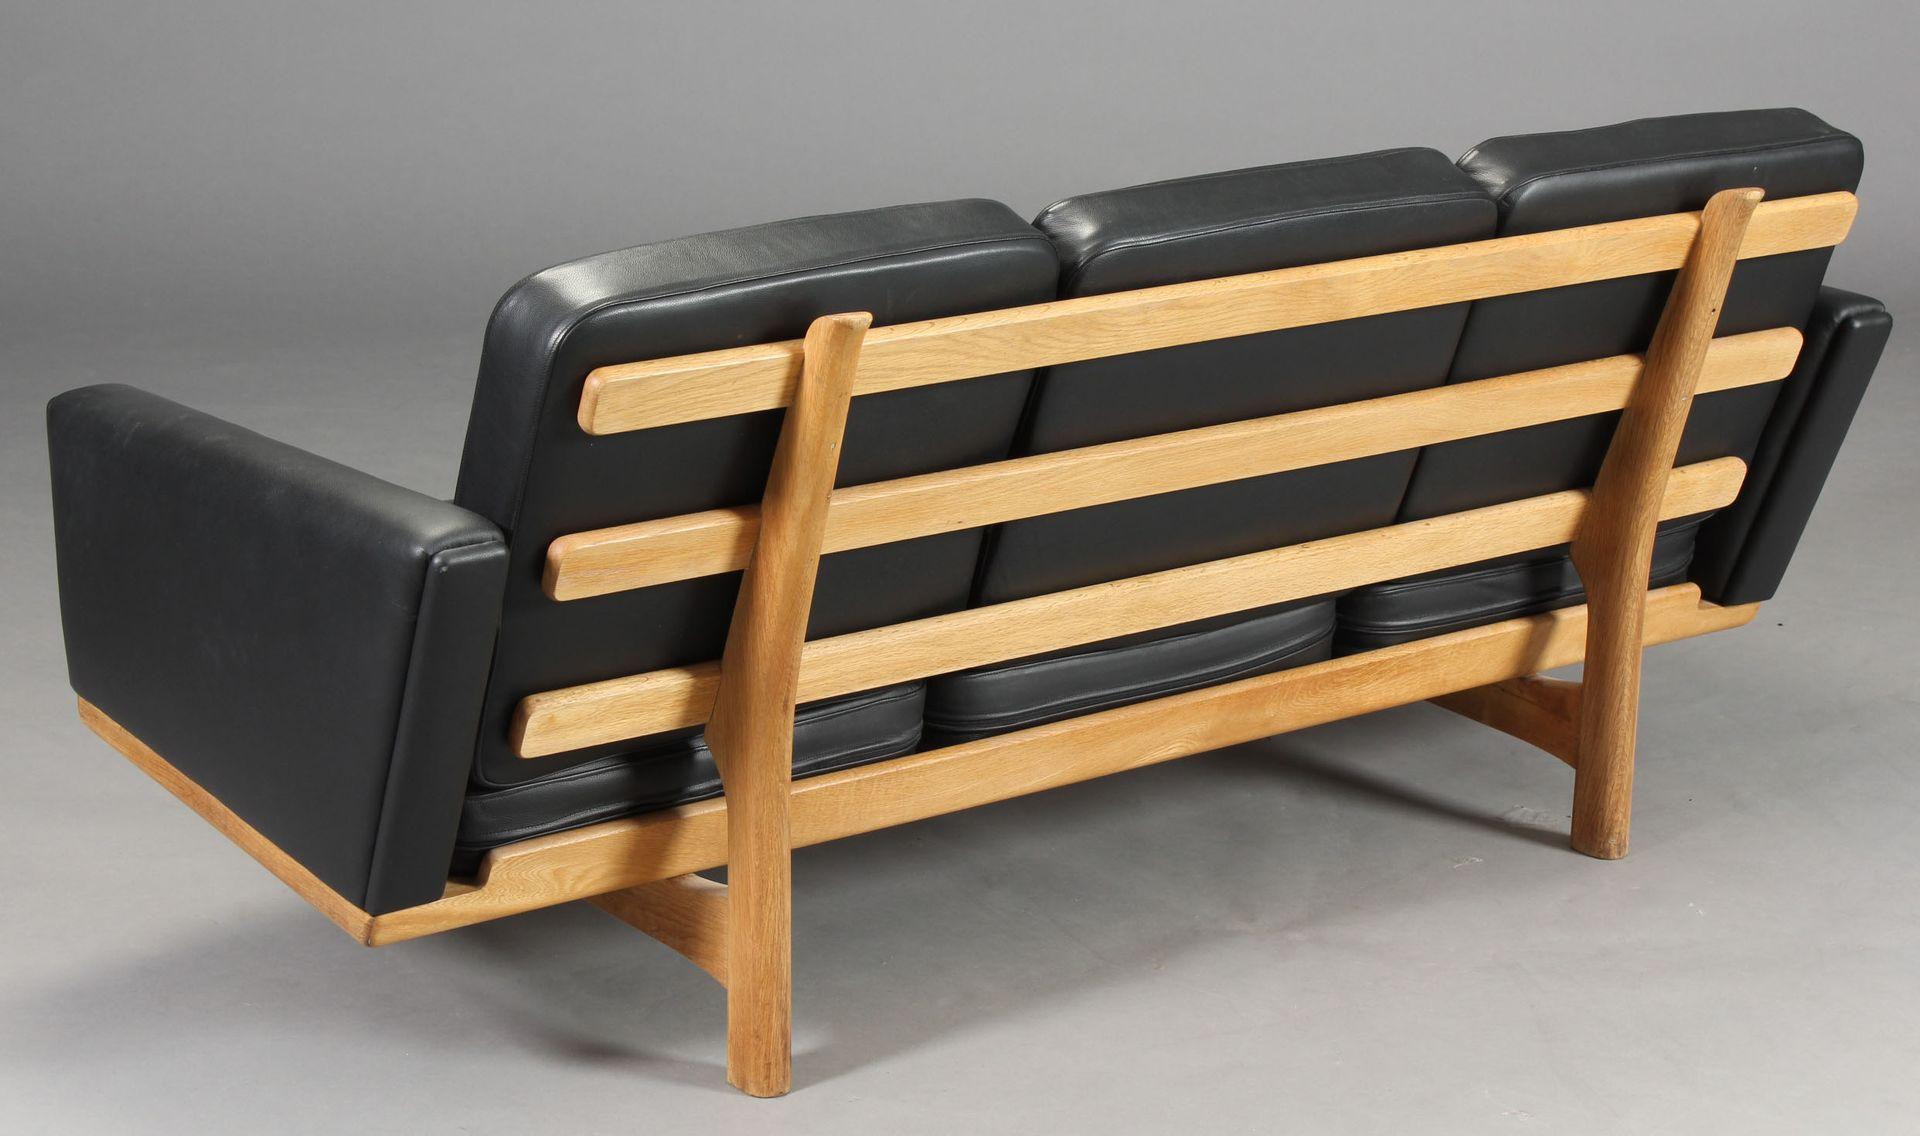 Mid Century GE 236 3 Sofa by Hans J Wegner for Getama for sale at